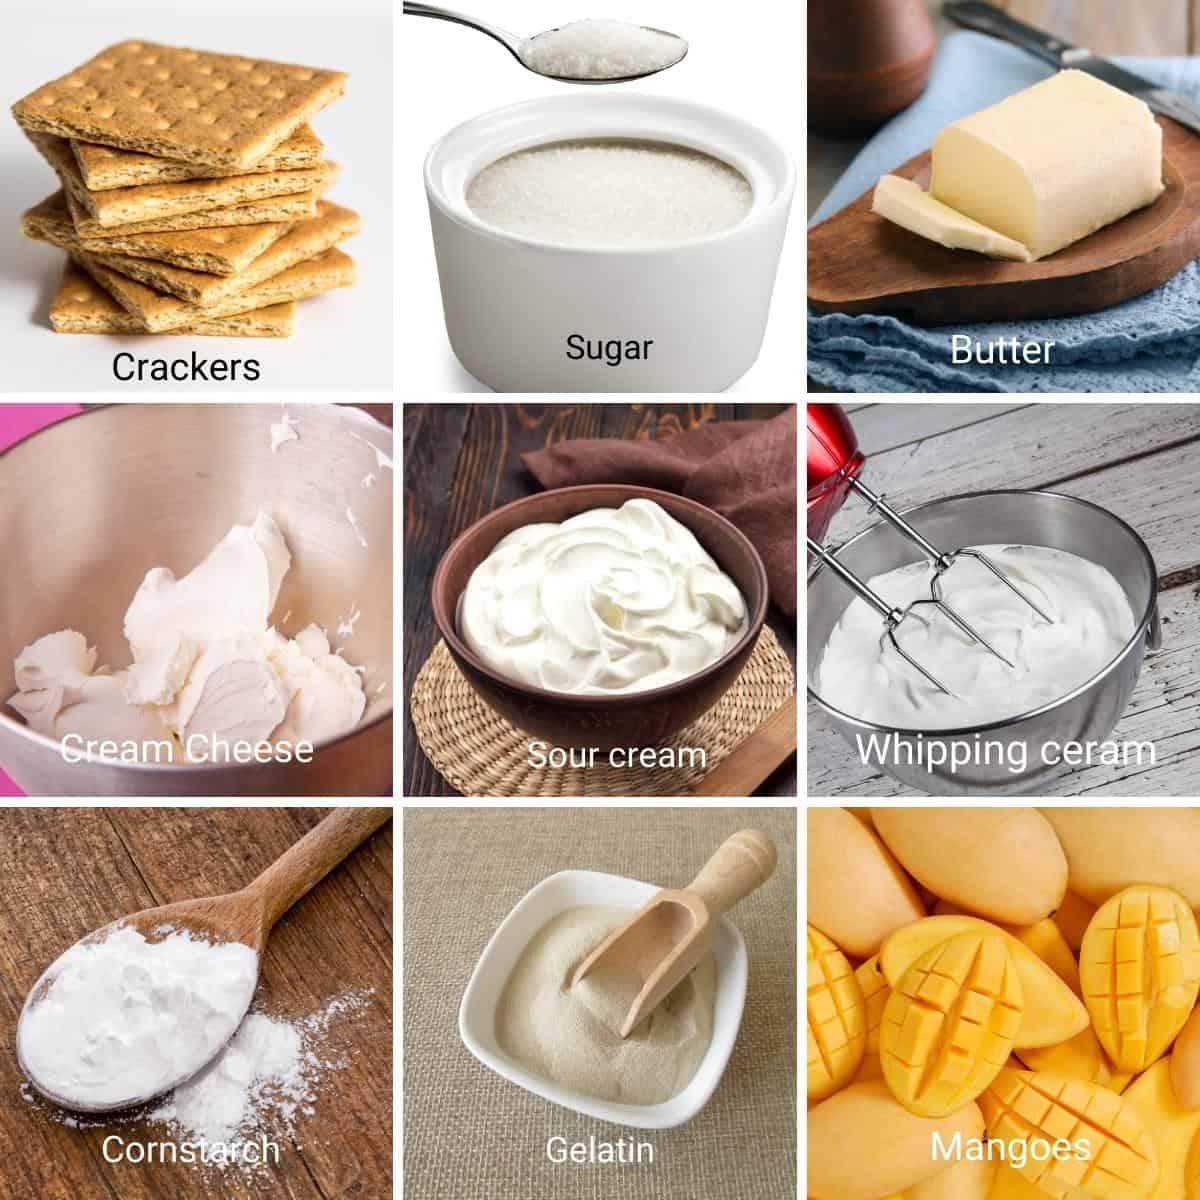 Ingredients shot collage for mango cheesecake.